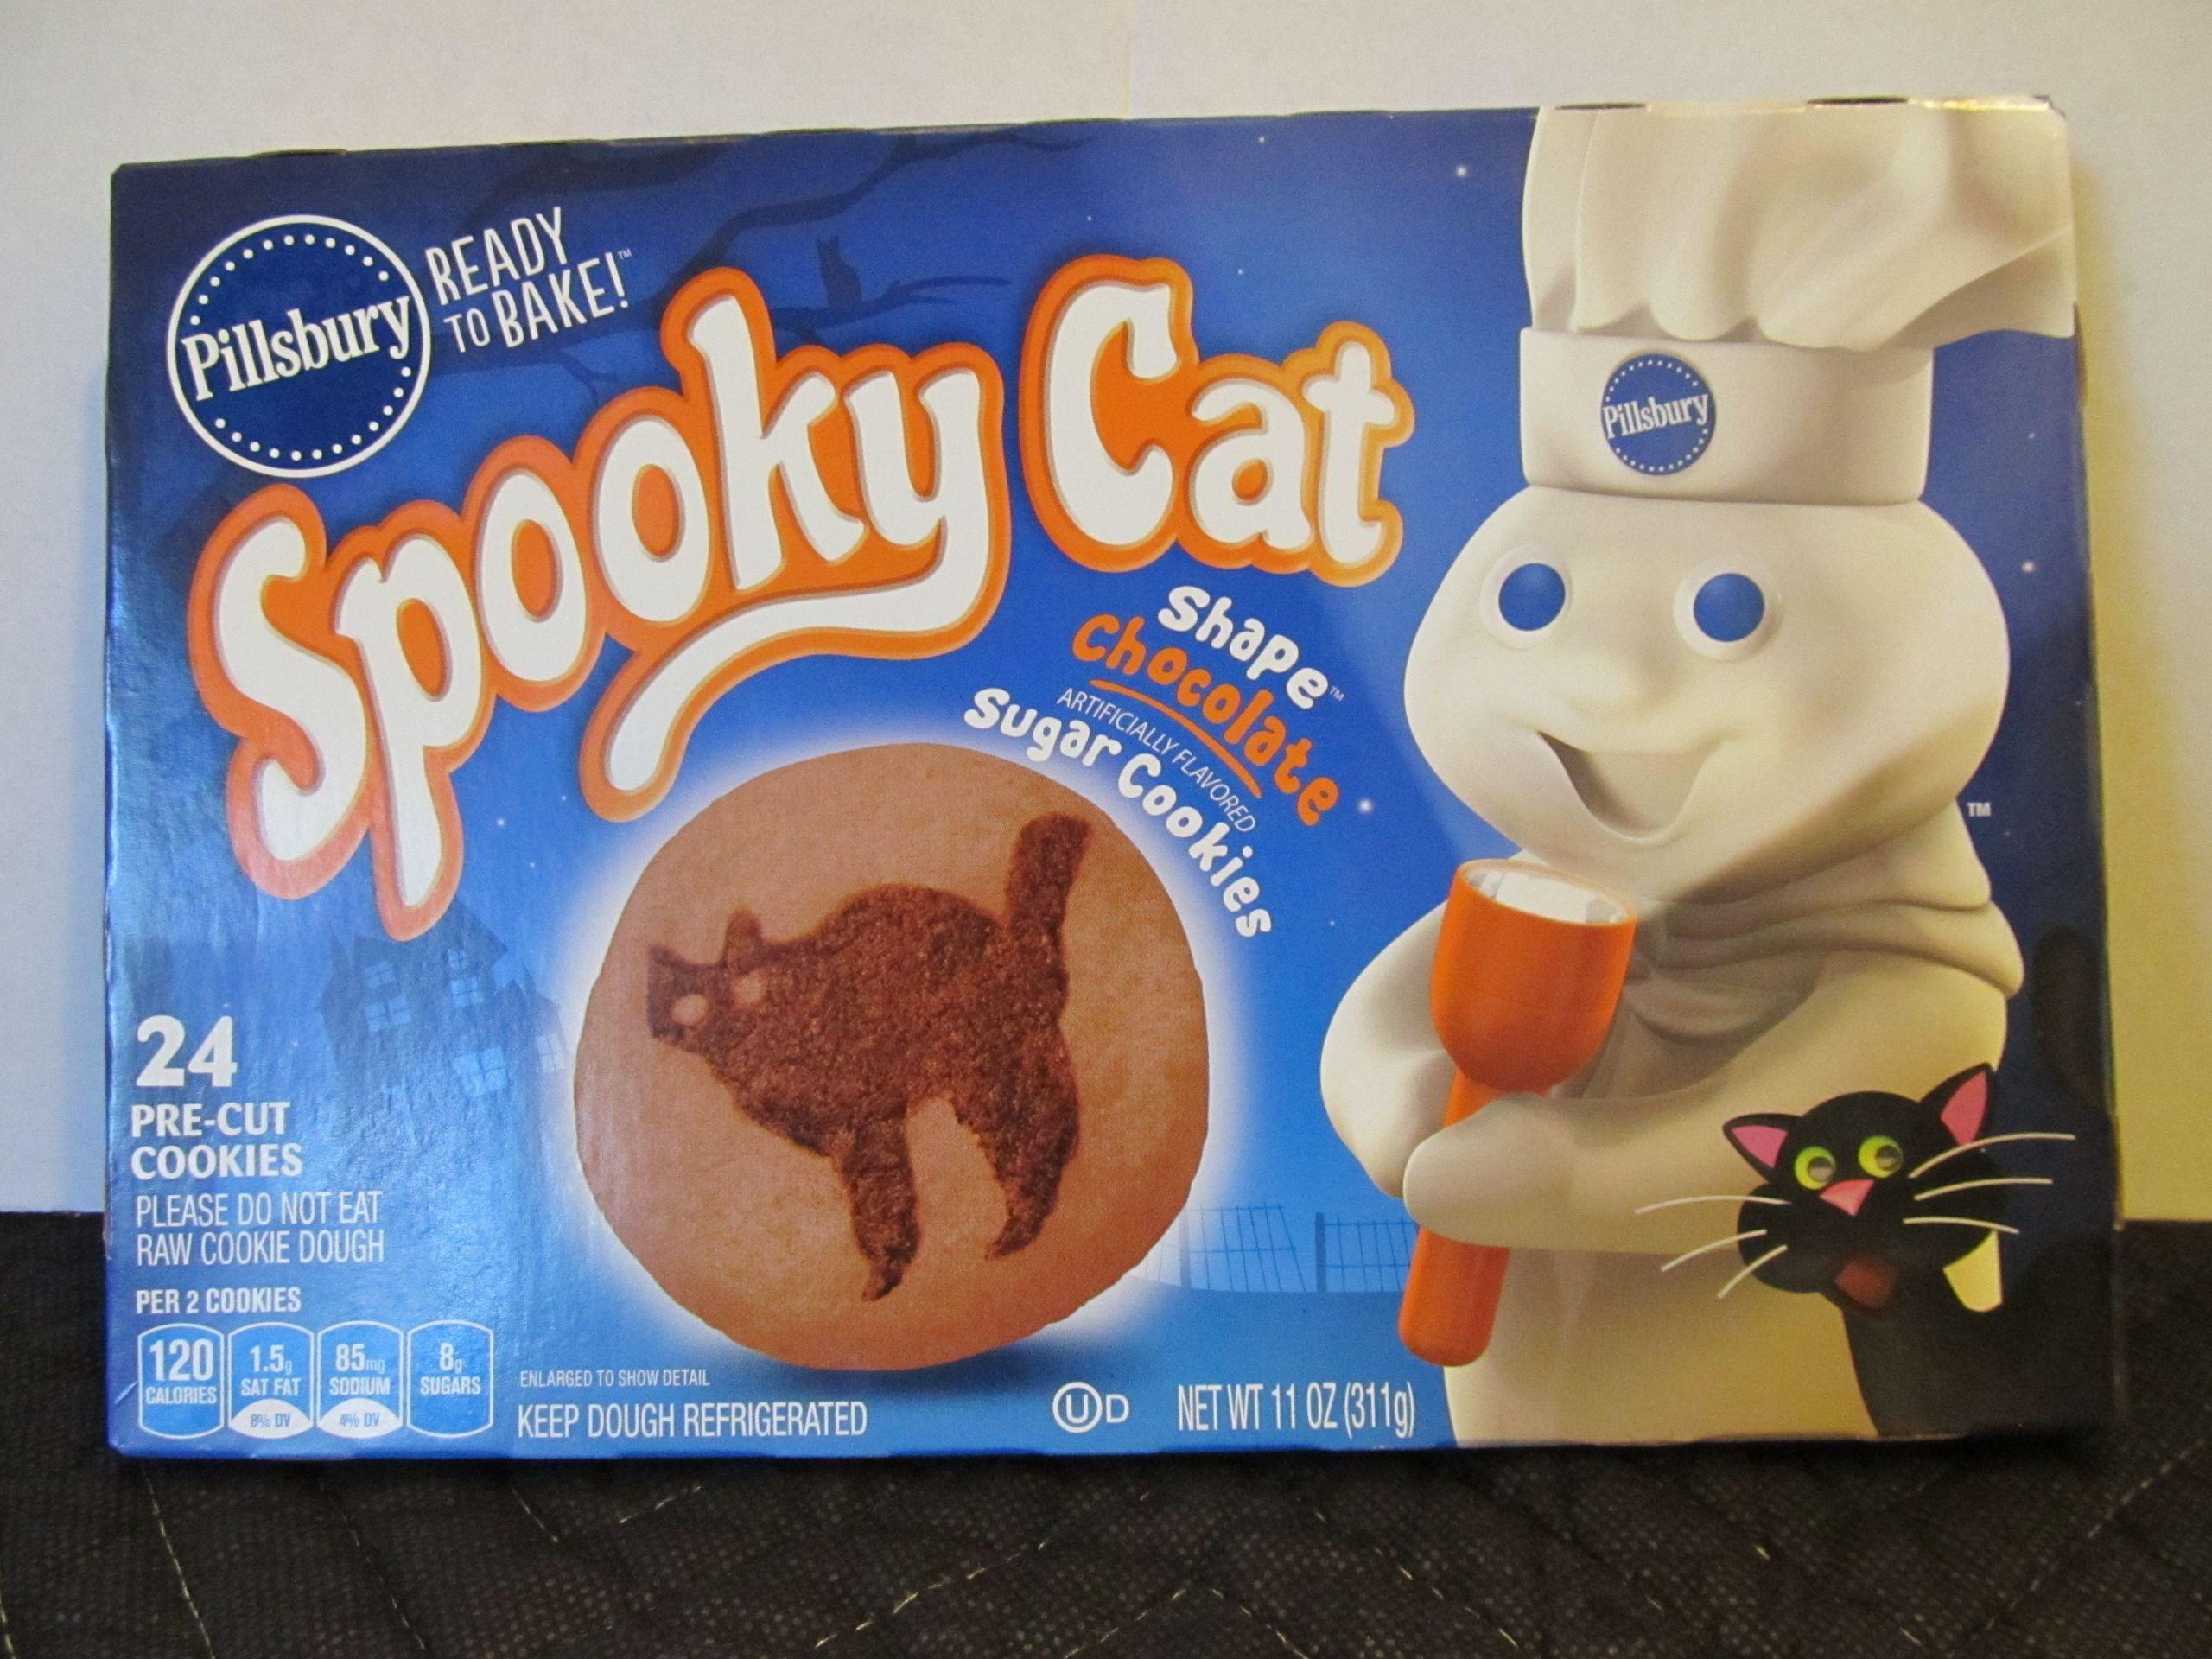 Pillsbury Halloween Sugar Cookies  Pillsbury Halloween Cookies Spooky Cat 2014 Package